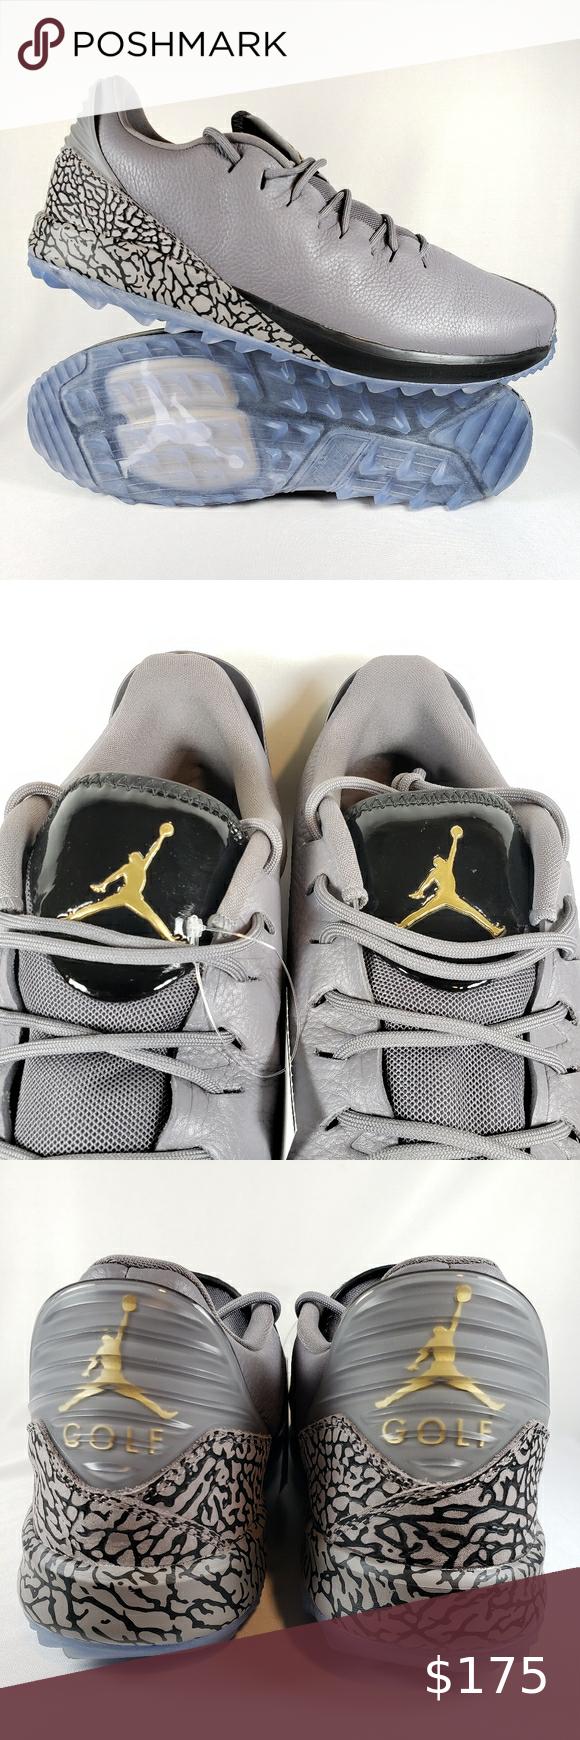 Nike Air Jordan ADG Golf Shoes Size 14